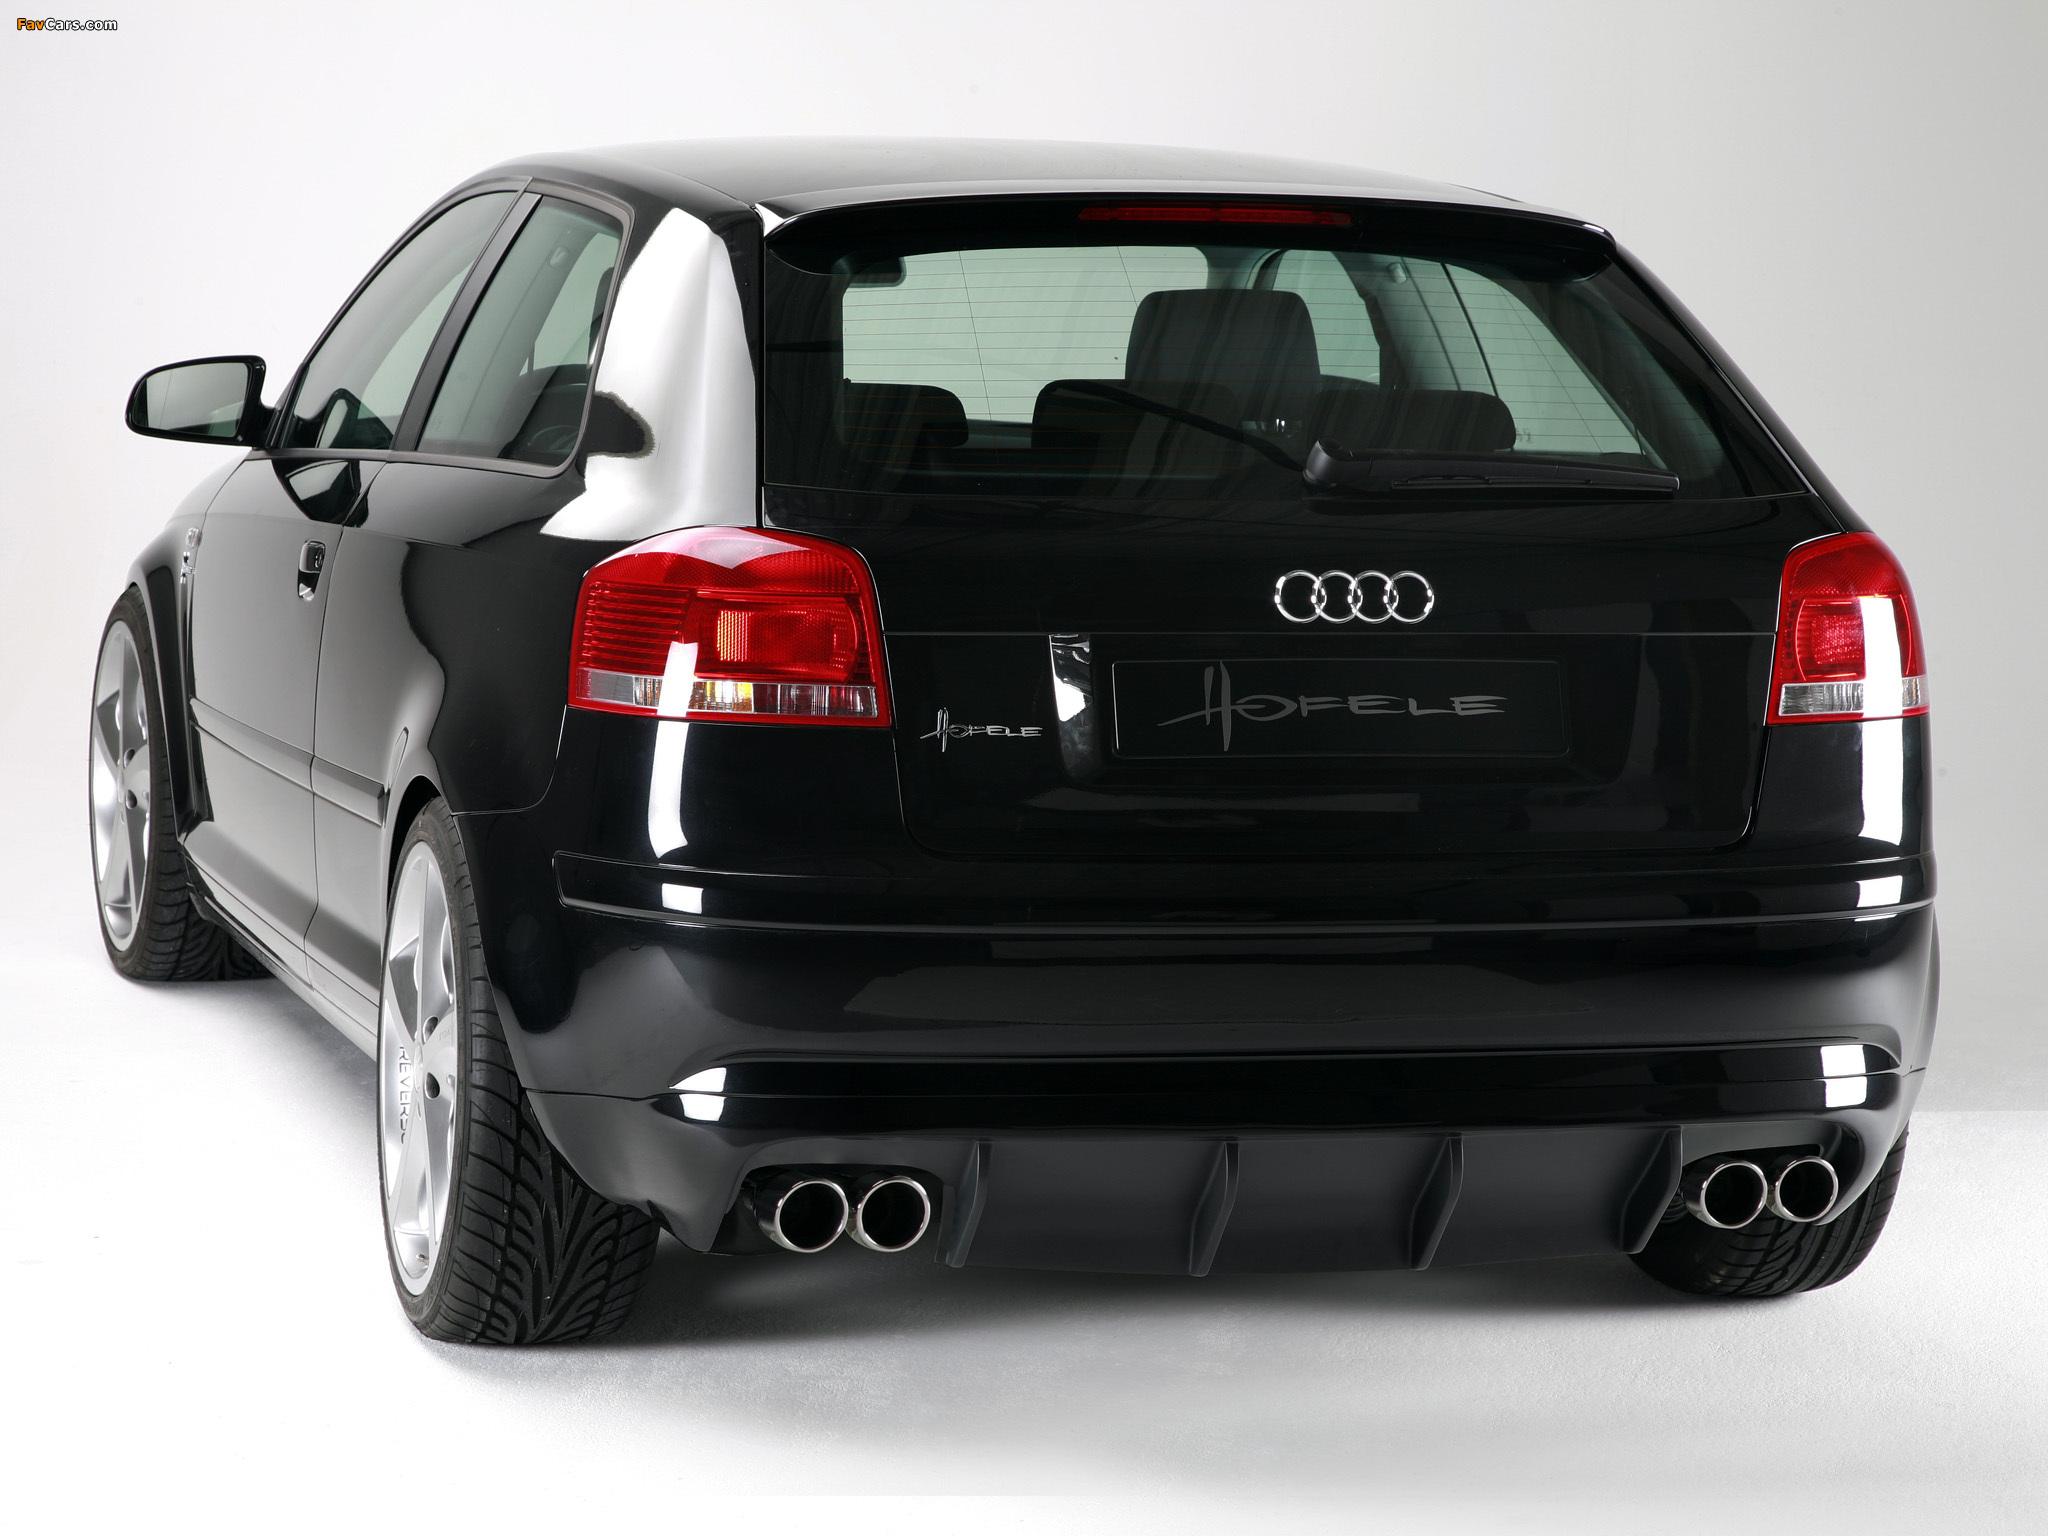 Hofele Design Audi A3 8p (2005–2008) Images